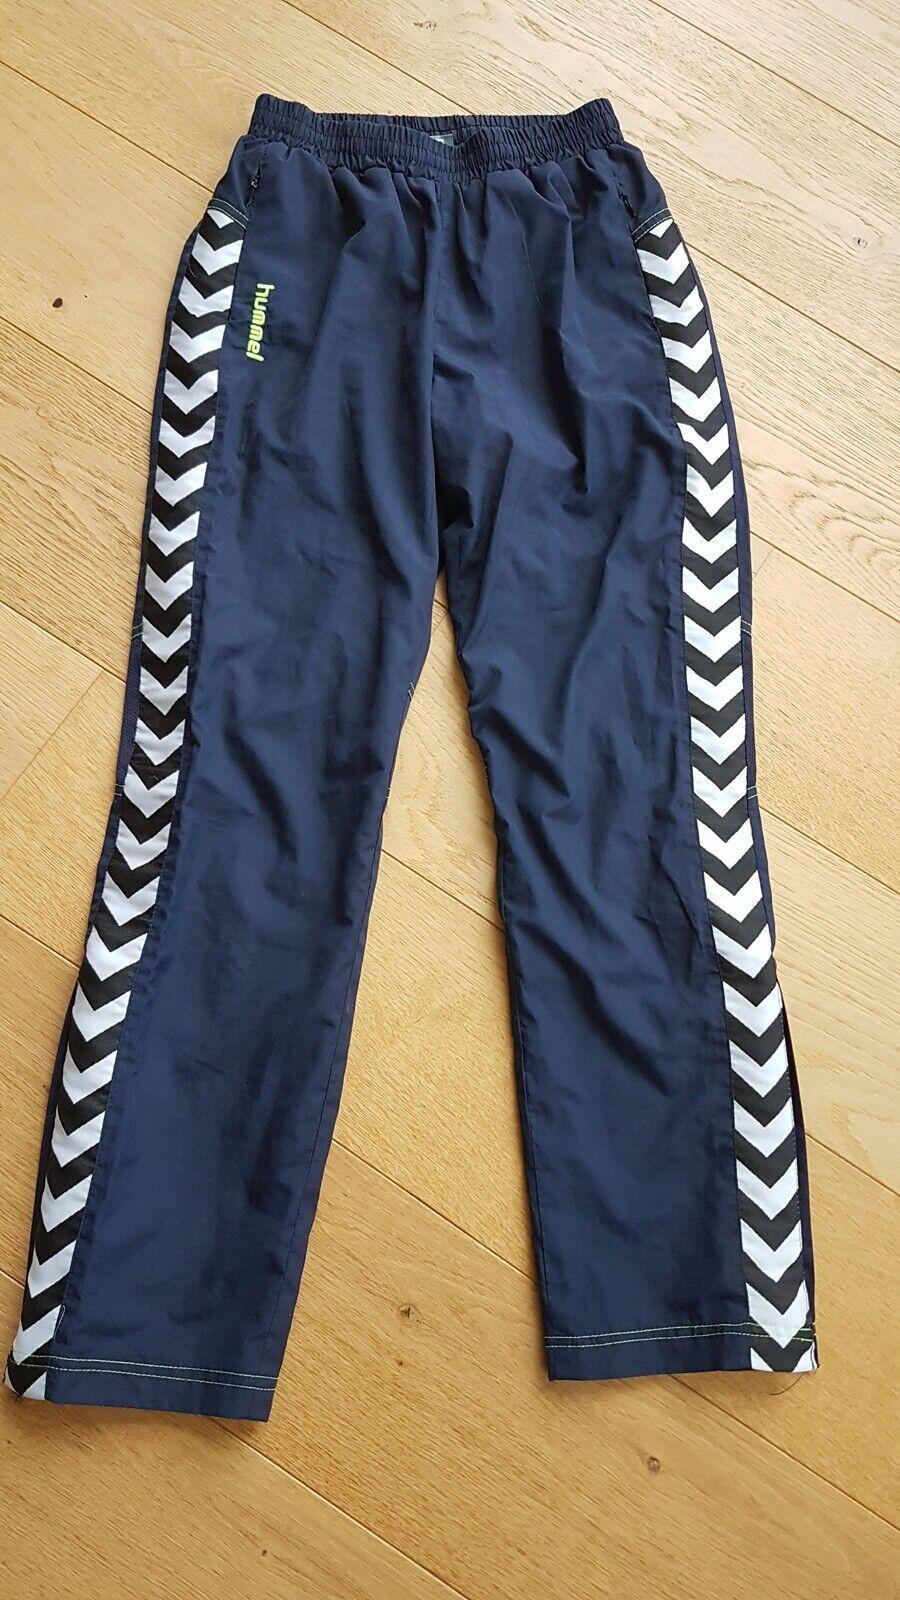 Bukser, Træningsbukser, Hummel